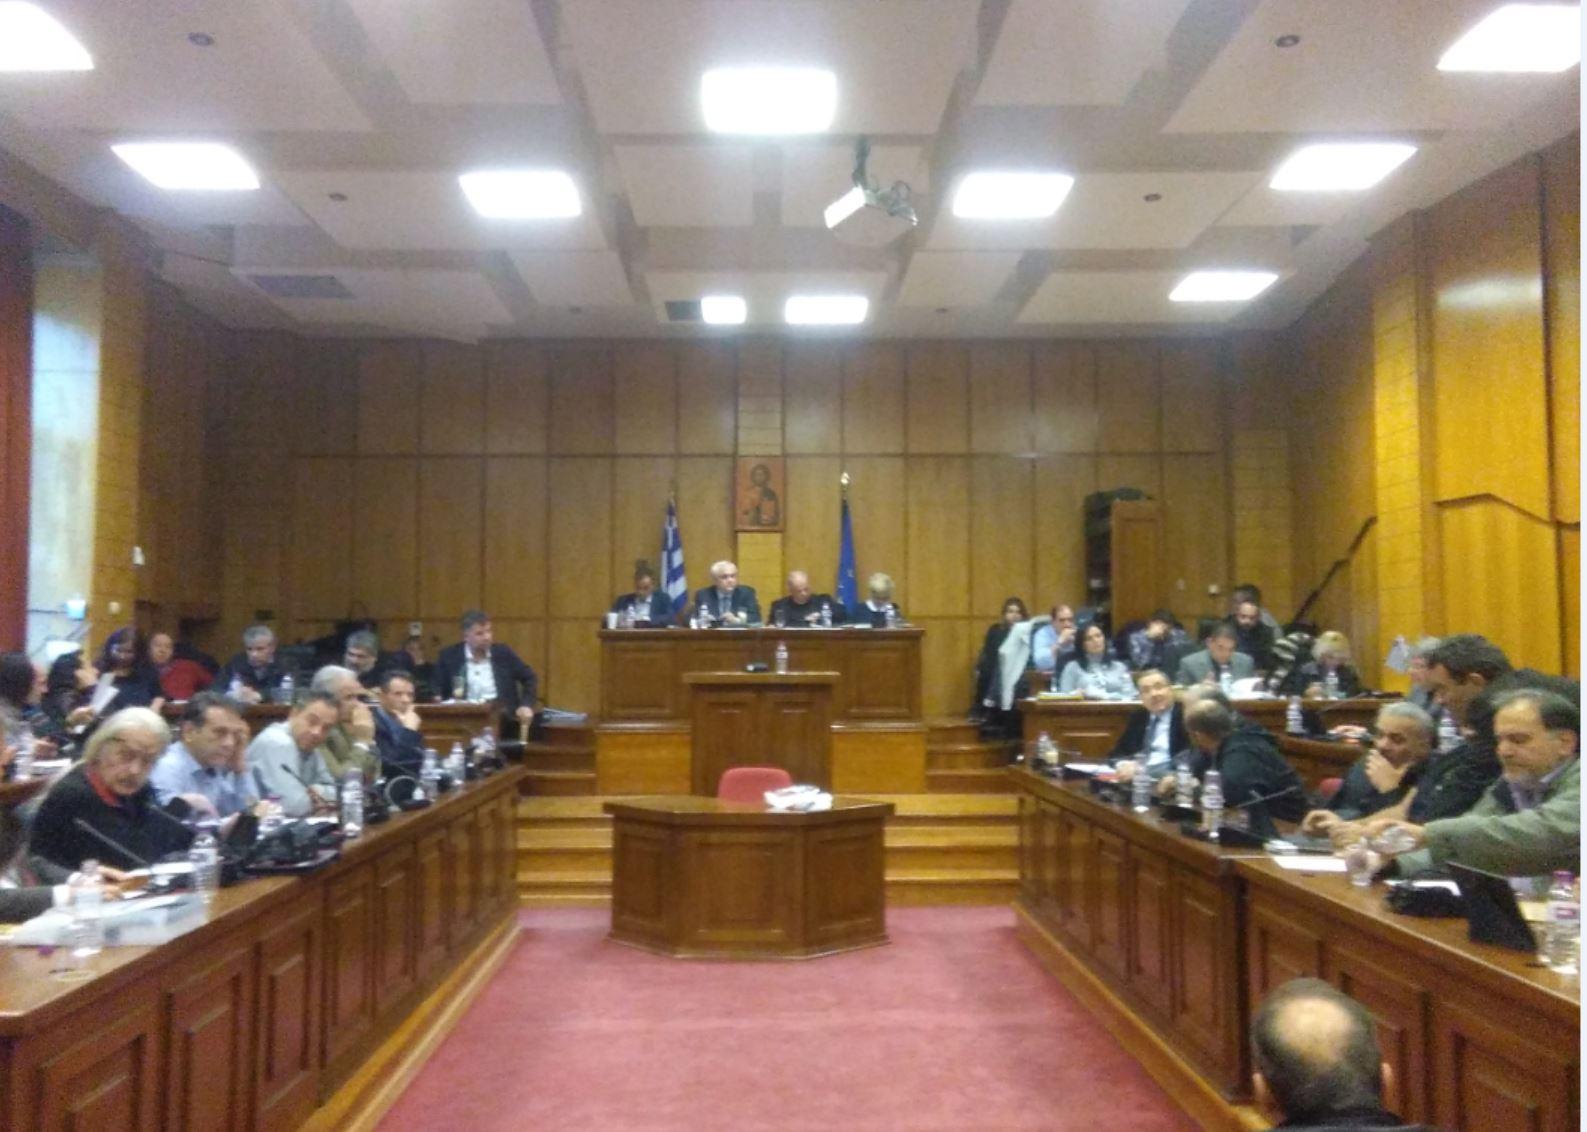 kozan.gr: Χύτρα Ειδήσεων: Χωρίς «Ελπίδα» το περιφερειακό συμβούλιο την Κυριακή 5/3